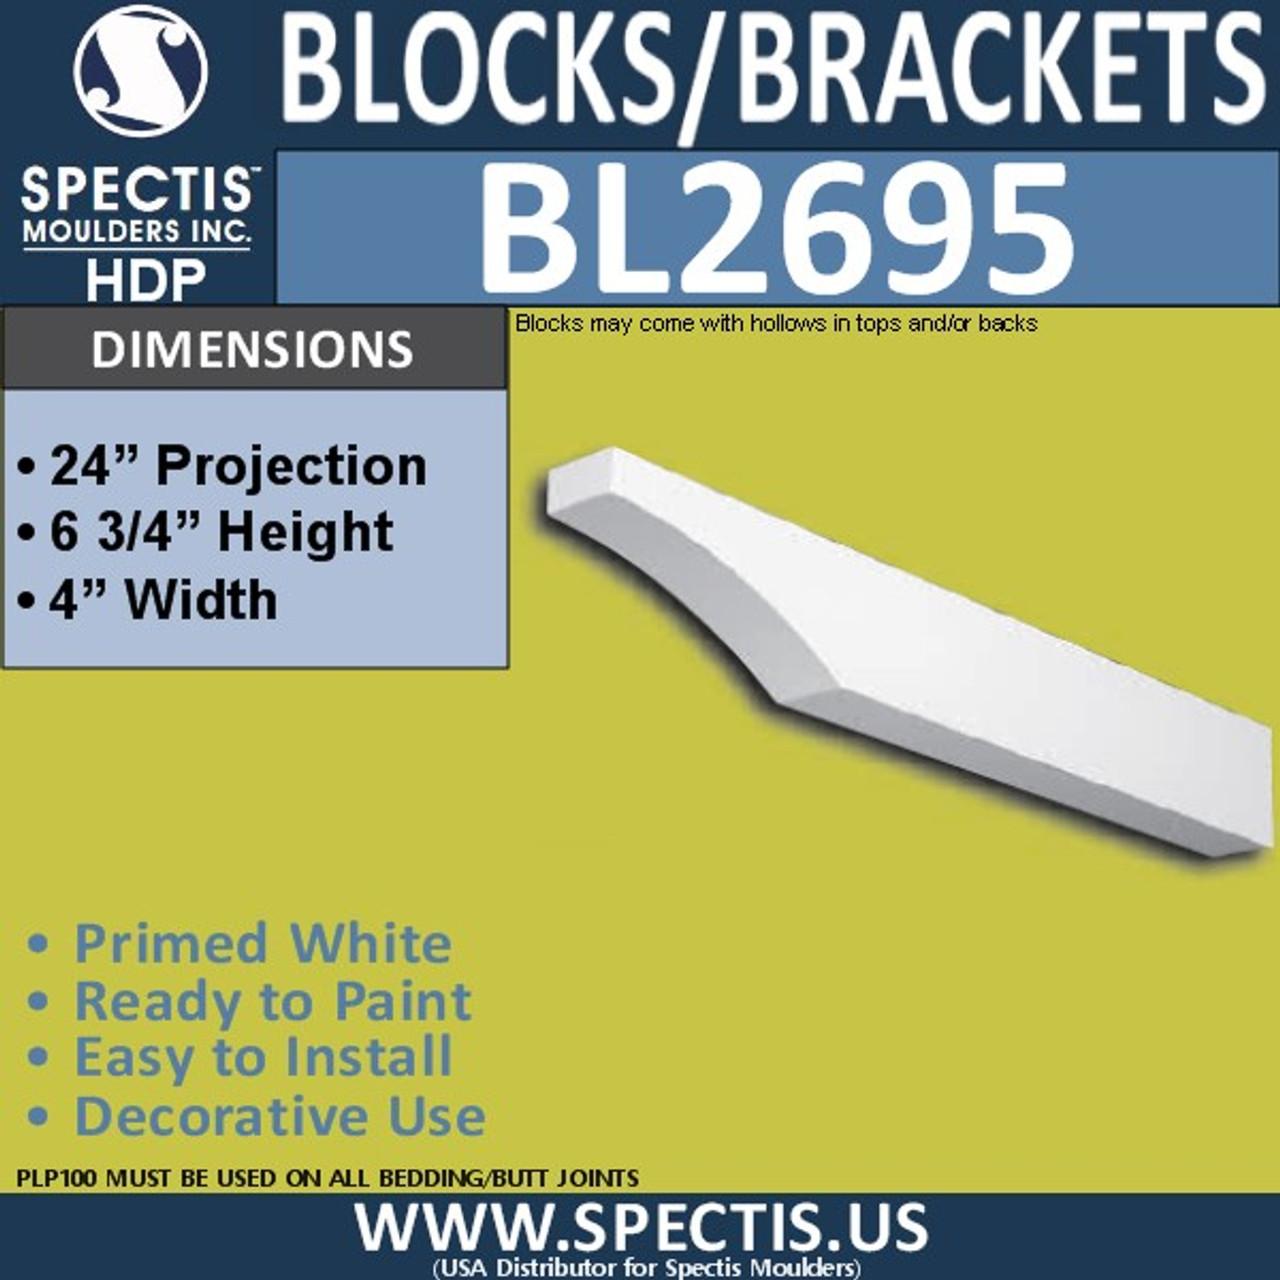 "BL2695 Eave Block or Bracket 4""W x 6.75""H x 24"" P"